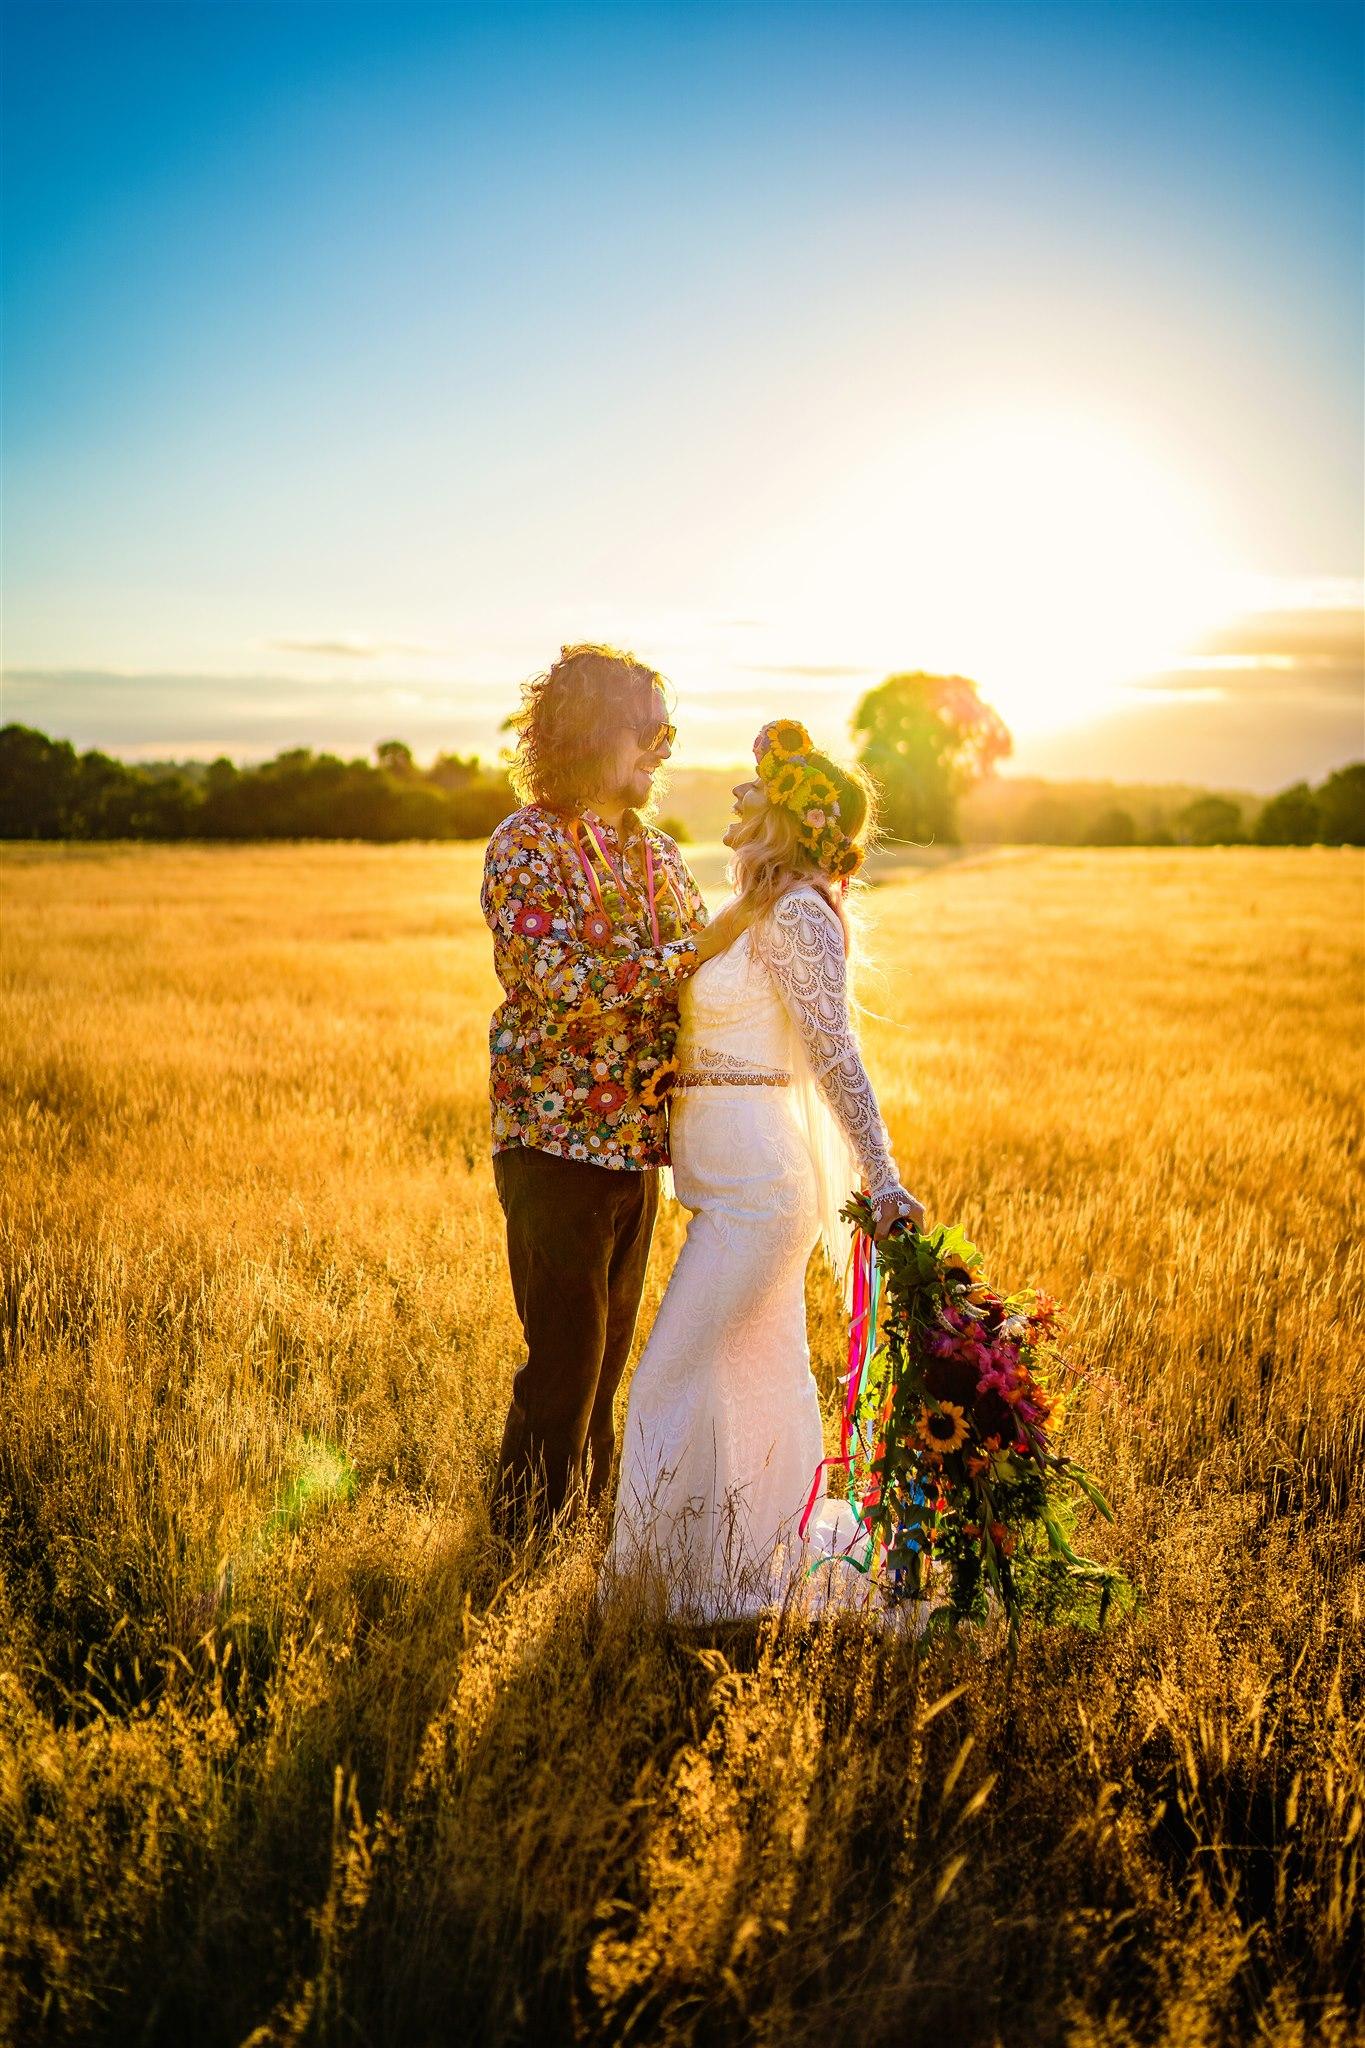 colourful bohemian wedding - 70s wedding - campervan wedding - hippie wedding - outdoor elopement - boho elopement